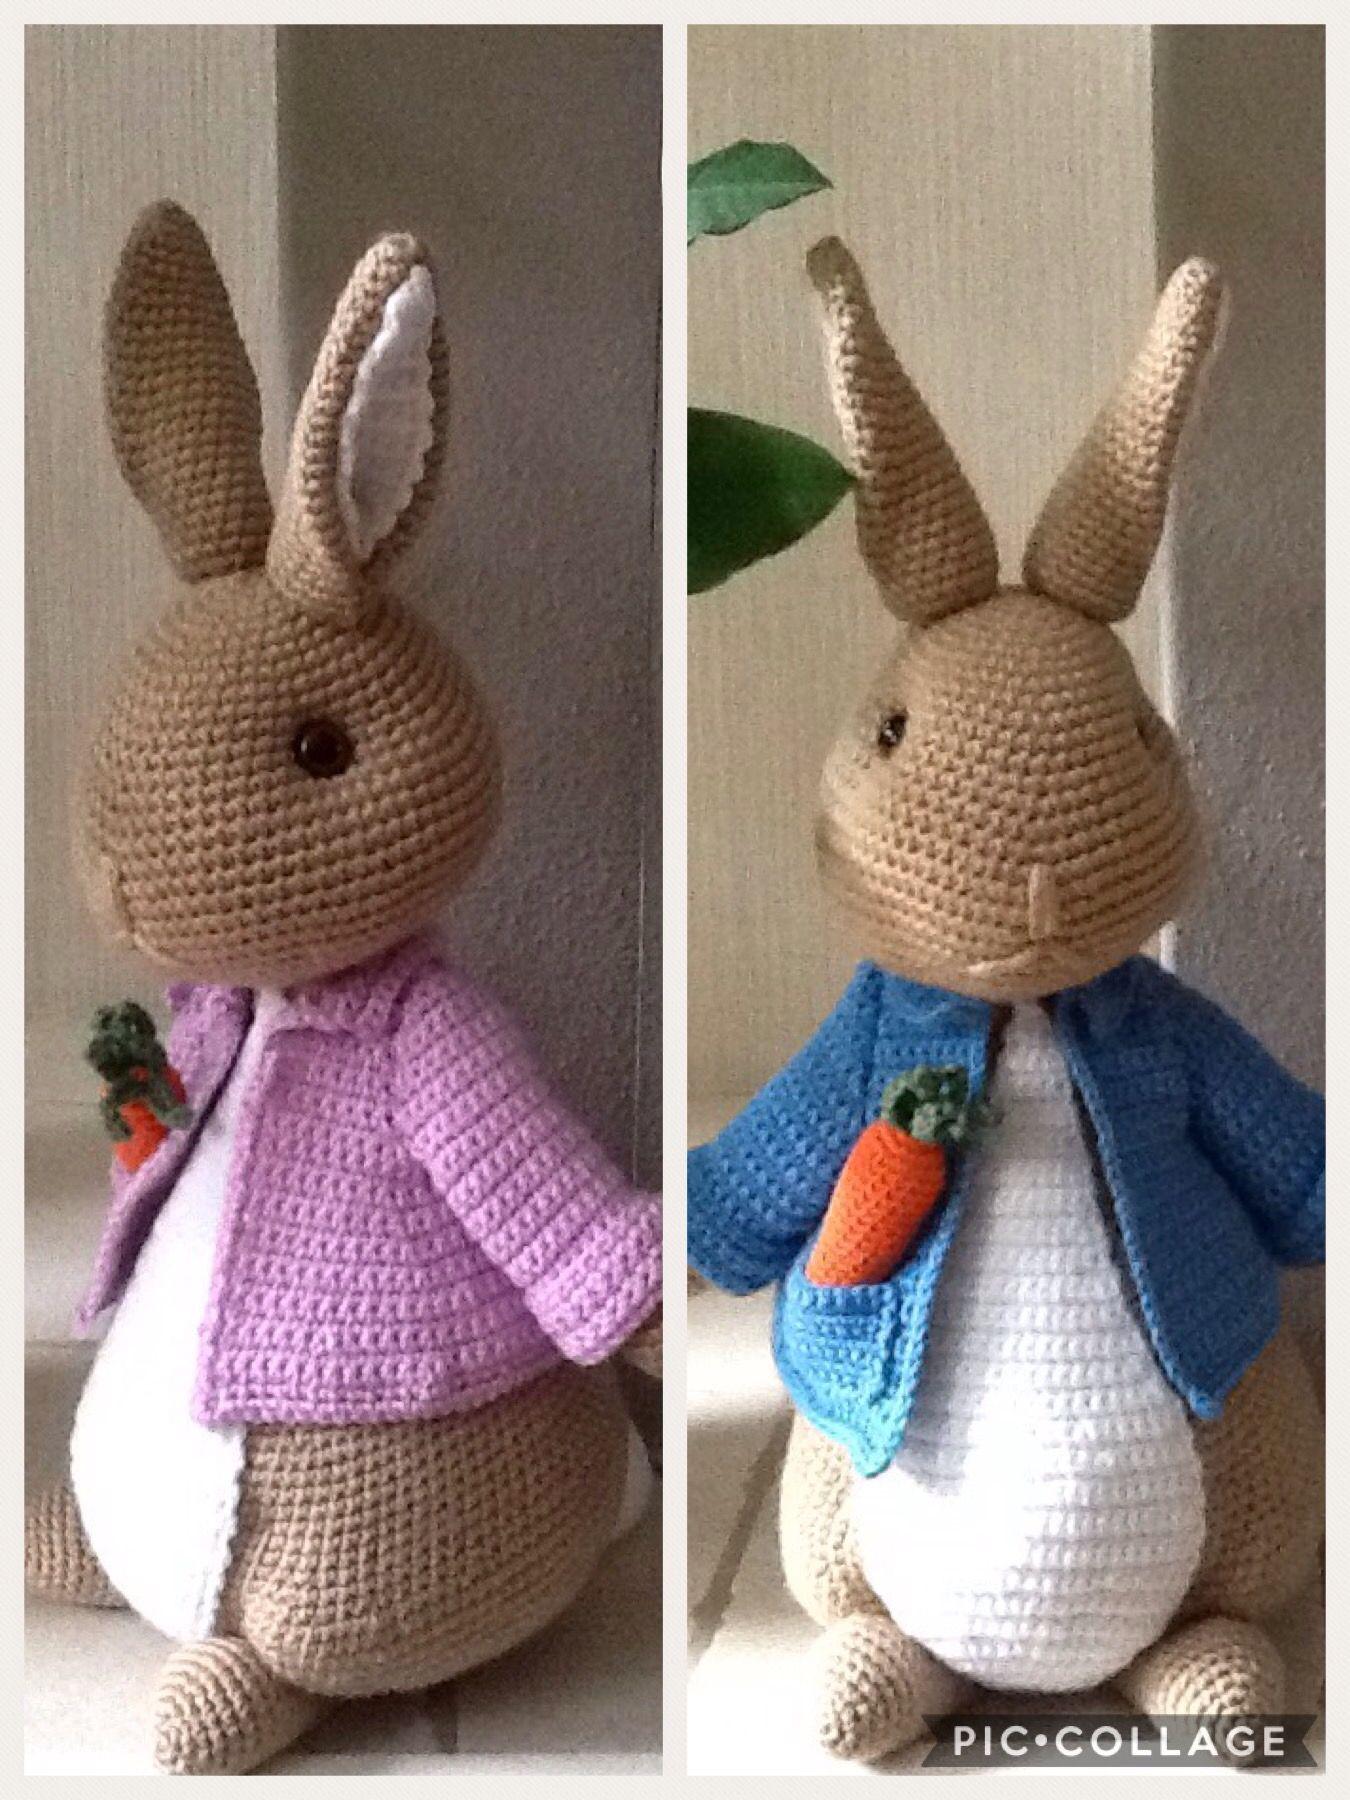 9 Patterns For Peter Rabbit Superfans   Top Crochet Patterns   1800x1350